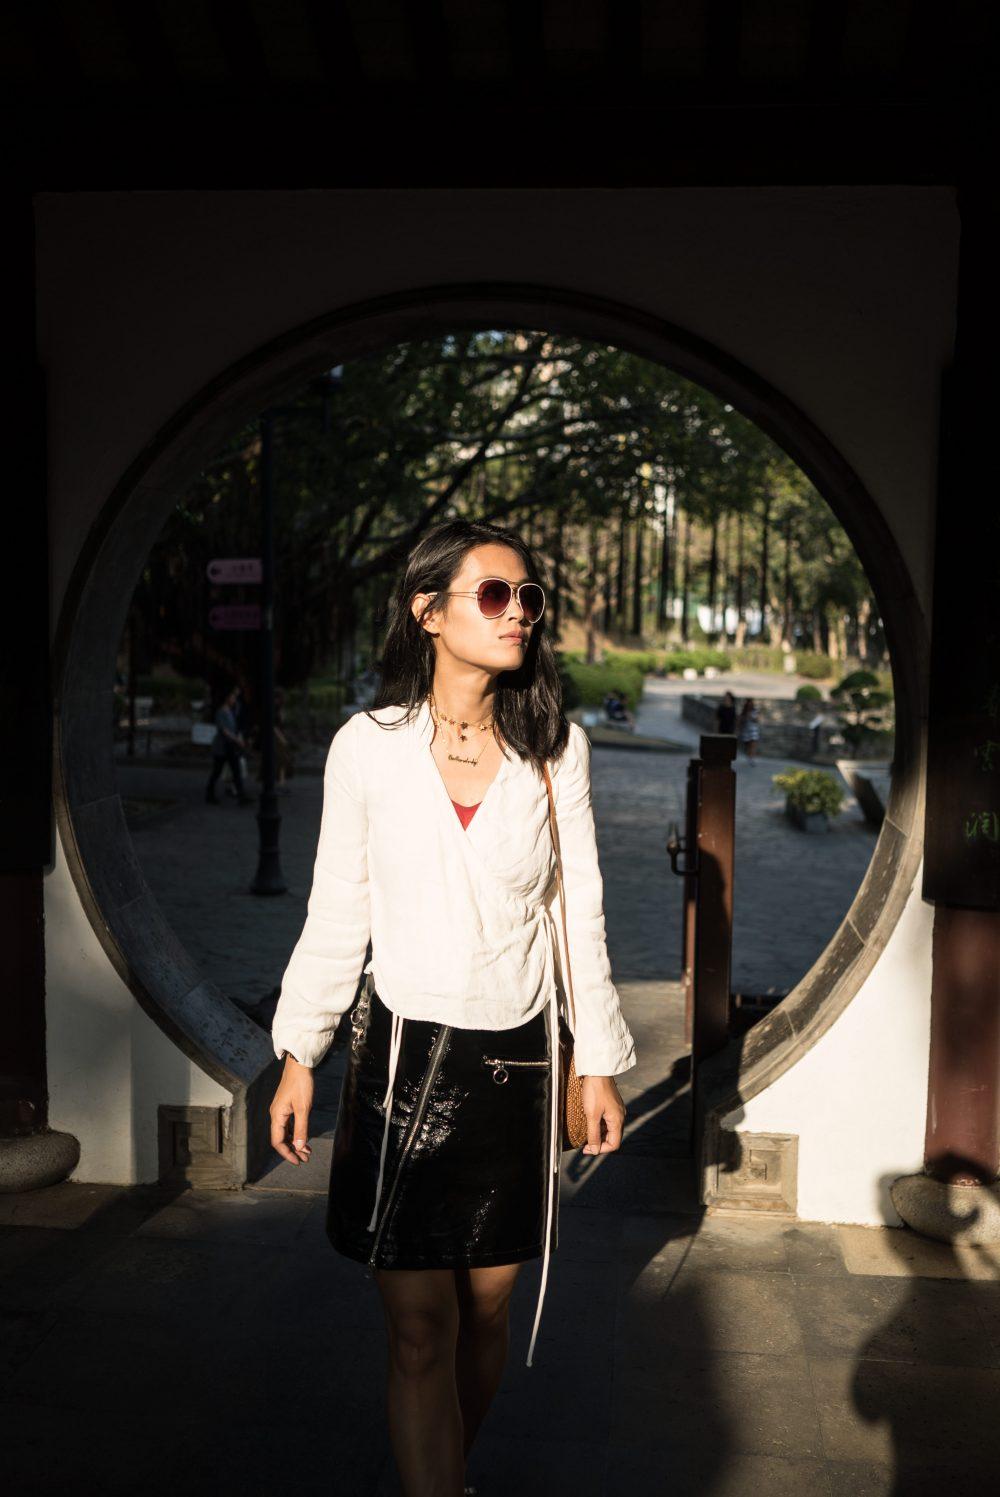 Hong kong, tarvel, blogger, travel blogger, city, travel diary, outlanderly, kowloon